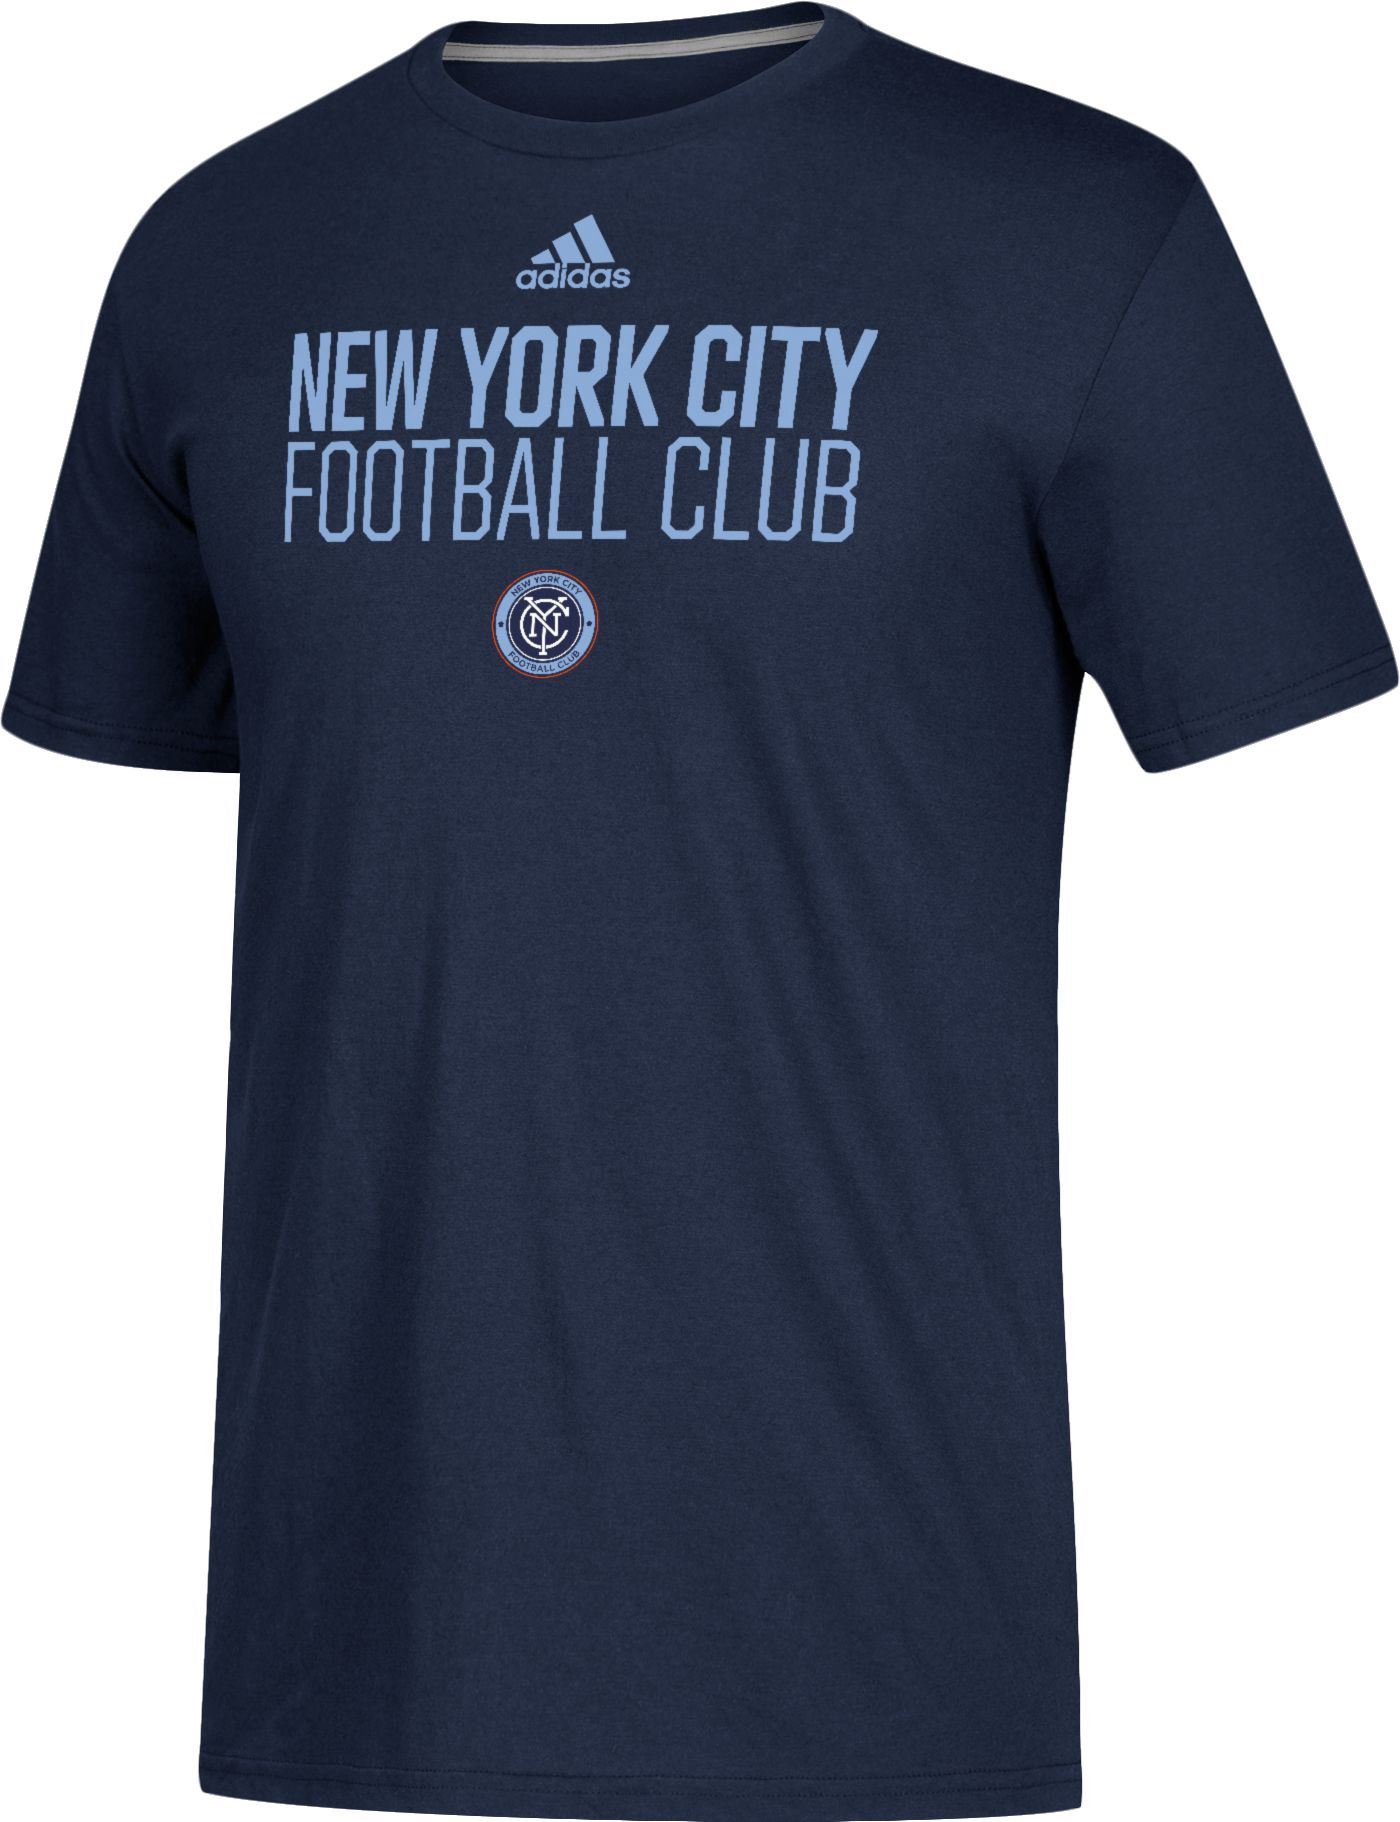 adidas Men's New York City FC Logo Navy Performance T-Shirt